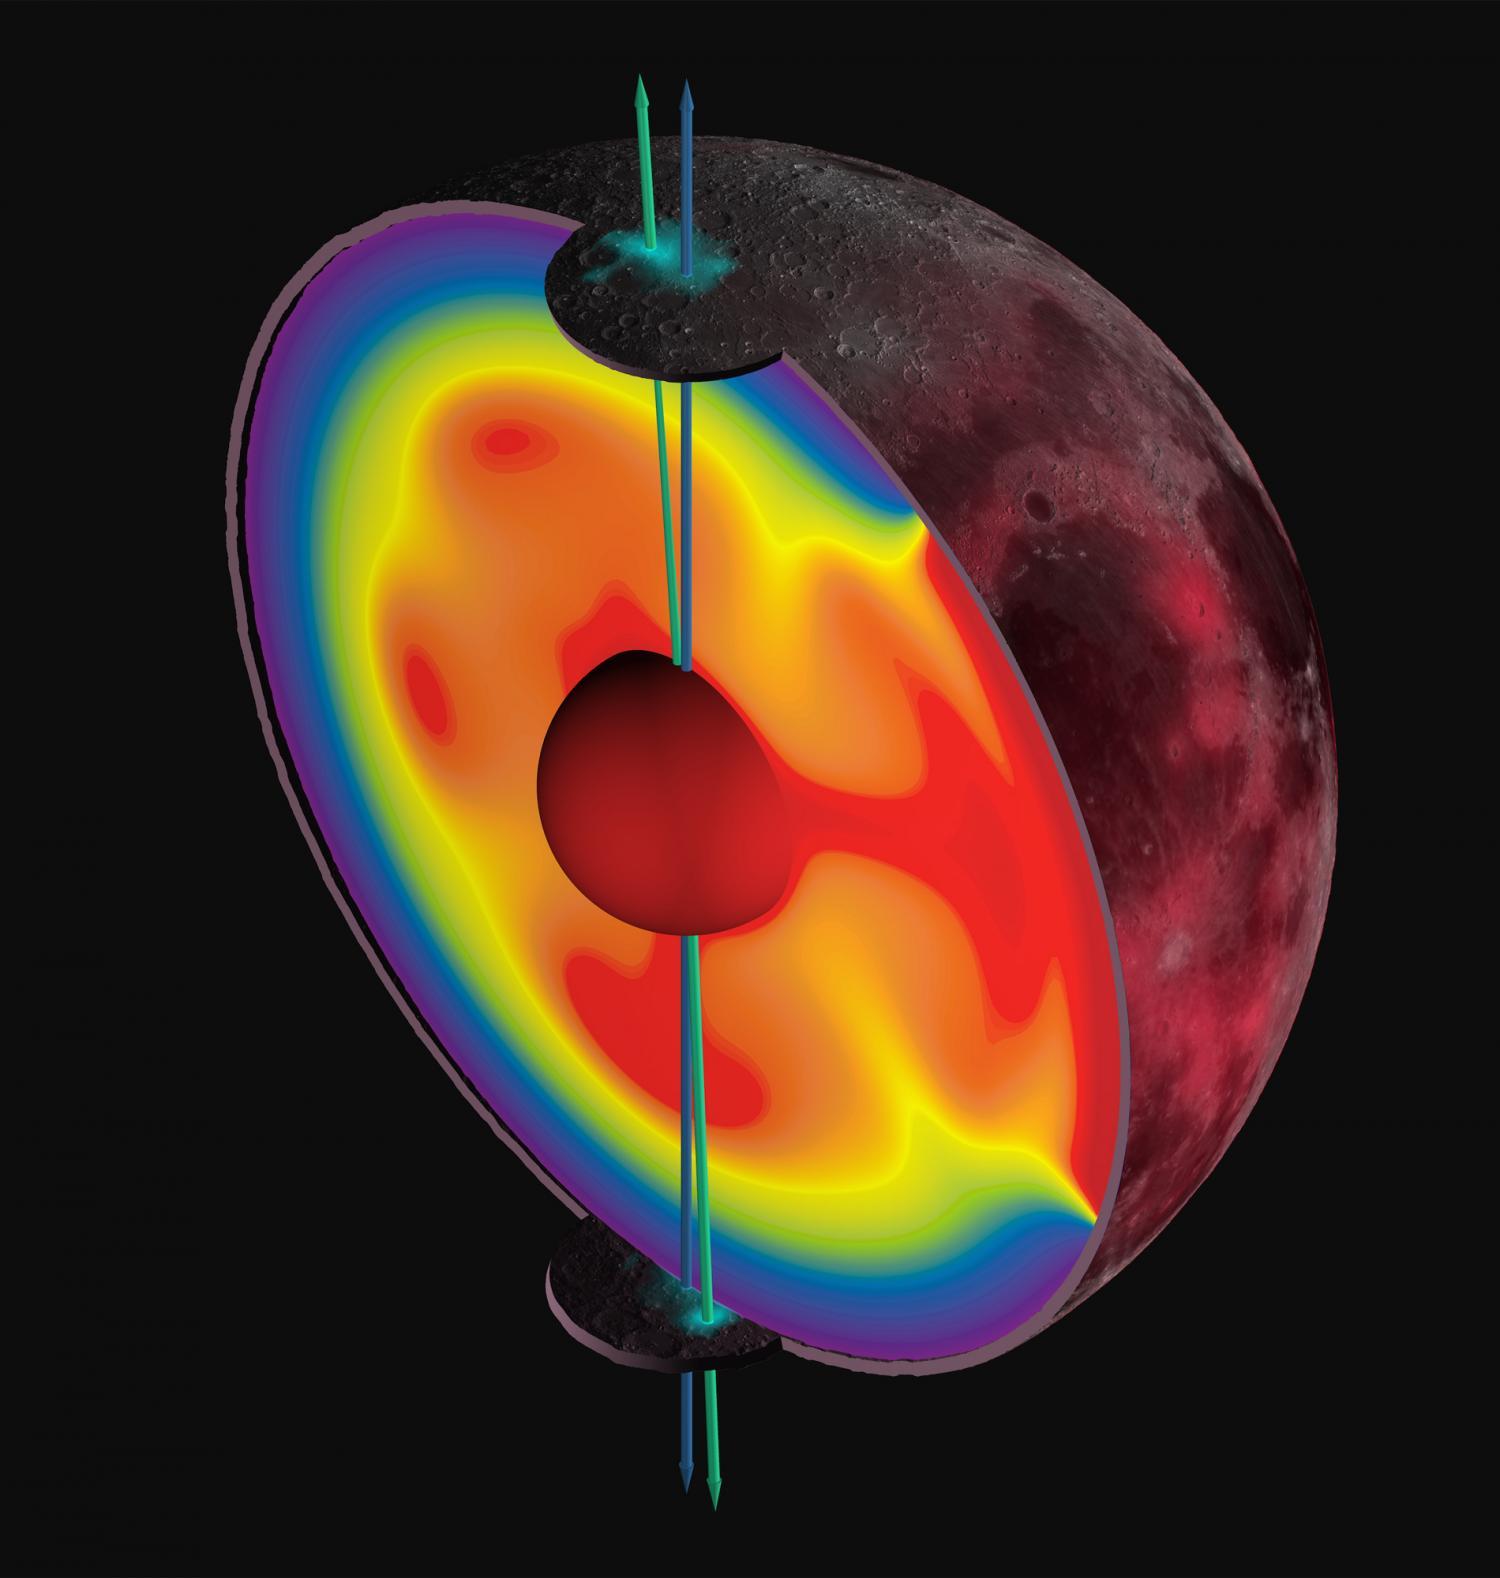 Earth's moon wandered off axis billions of years ago ...